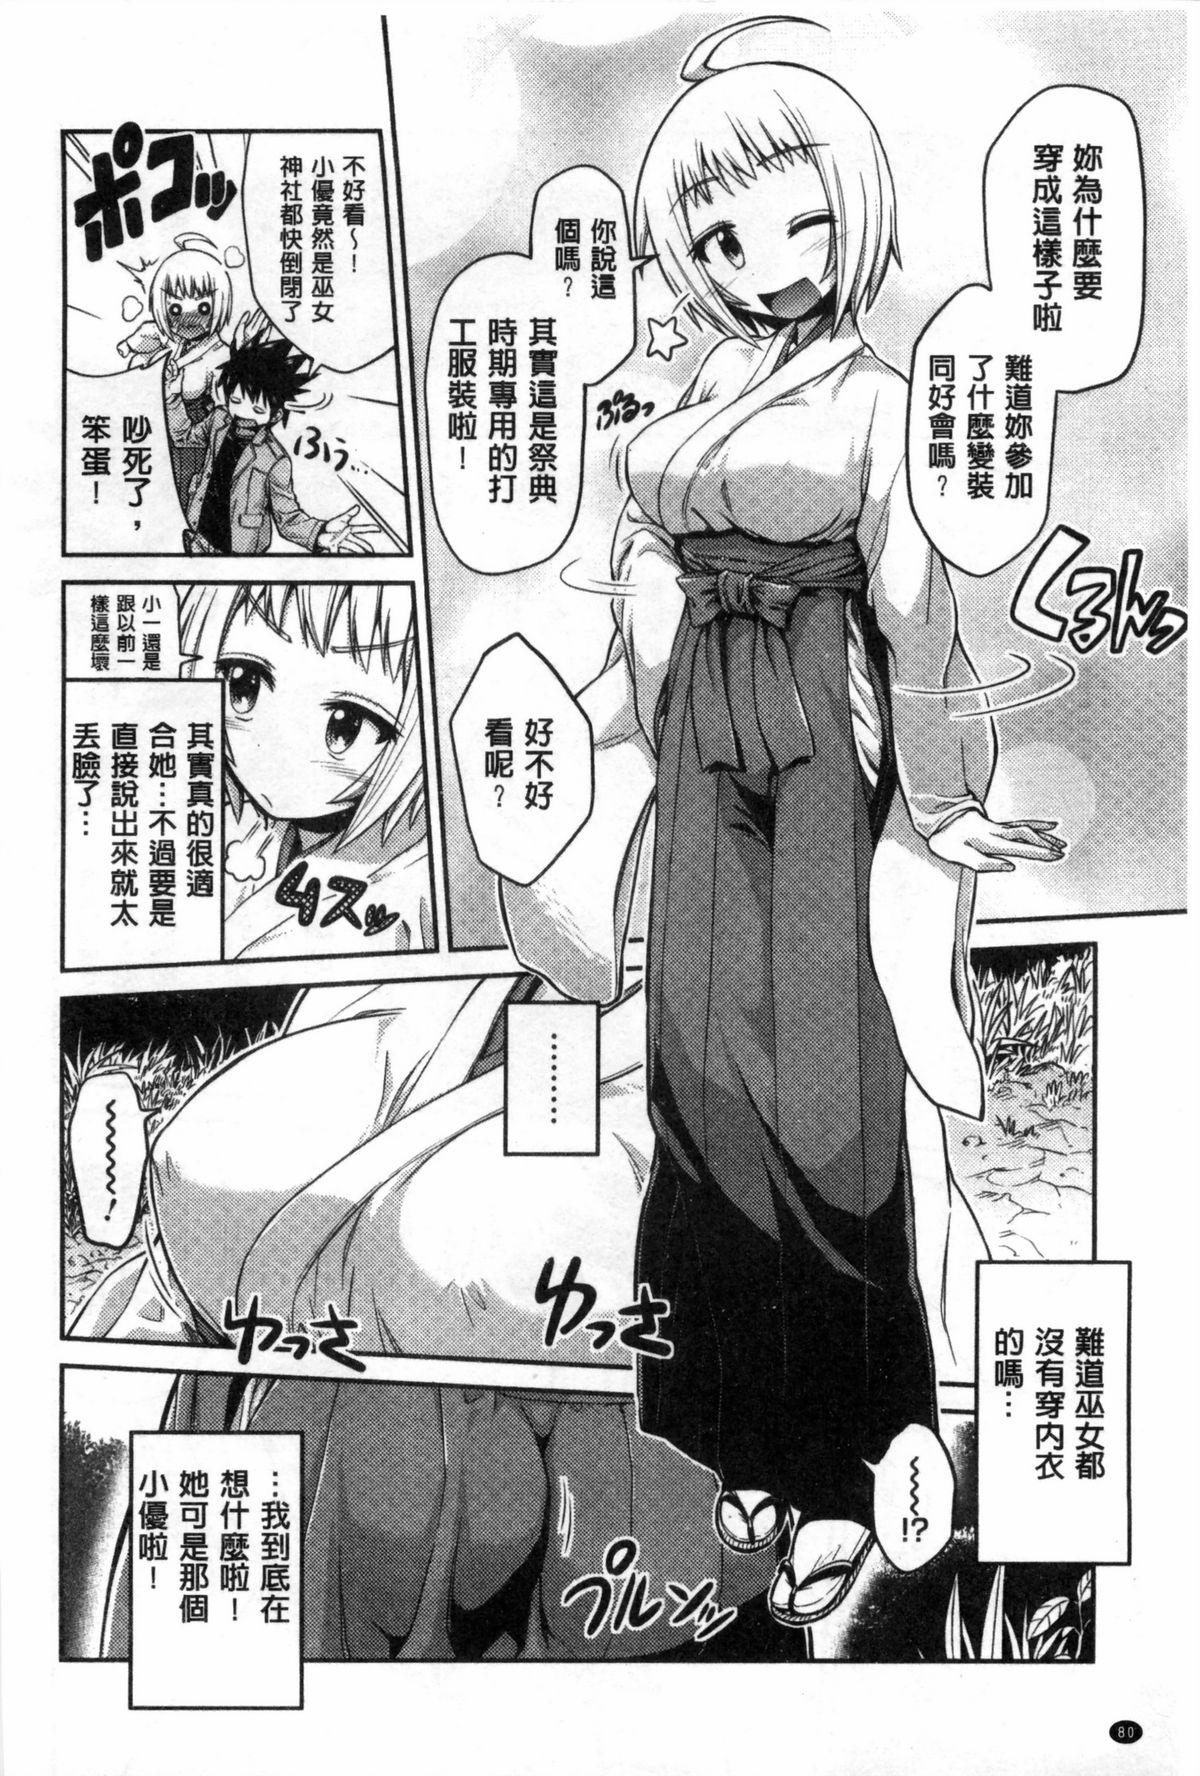 Man x Koi - Ero Manga de Hajimaru Koi no Plot   A漫×戀情 由情色漫畫所萌生的戀之物語 80